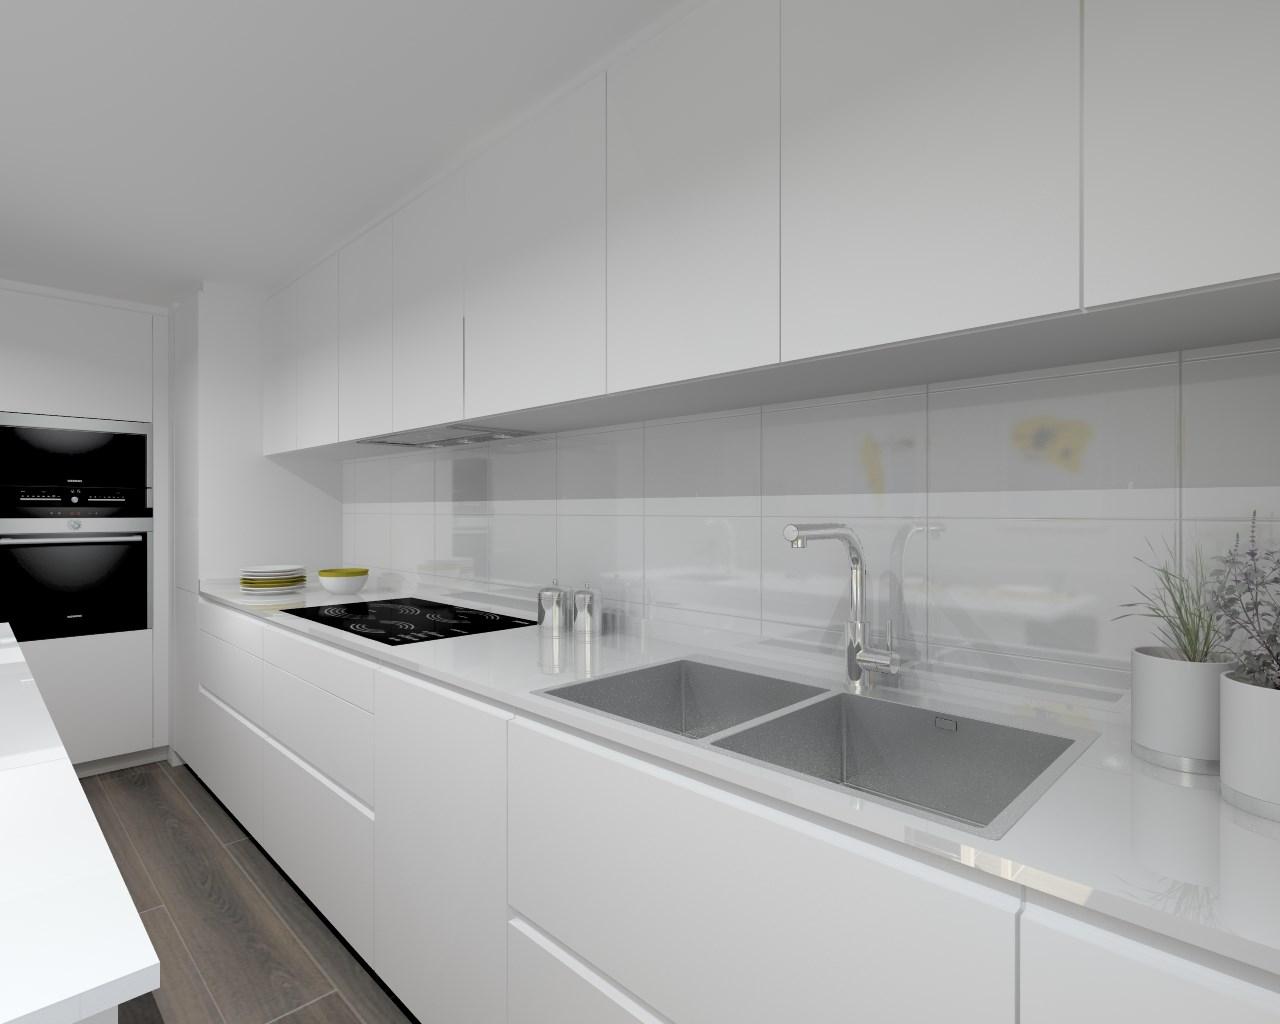 Aravaca cocina santos modelo laminado blanco - Cocinas de silestone ...